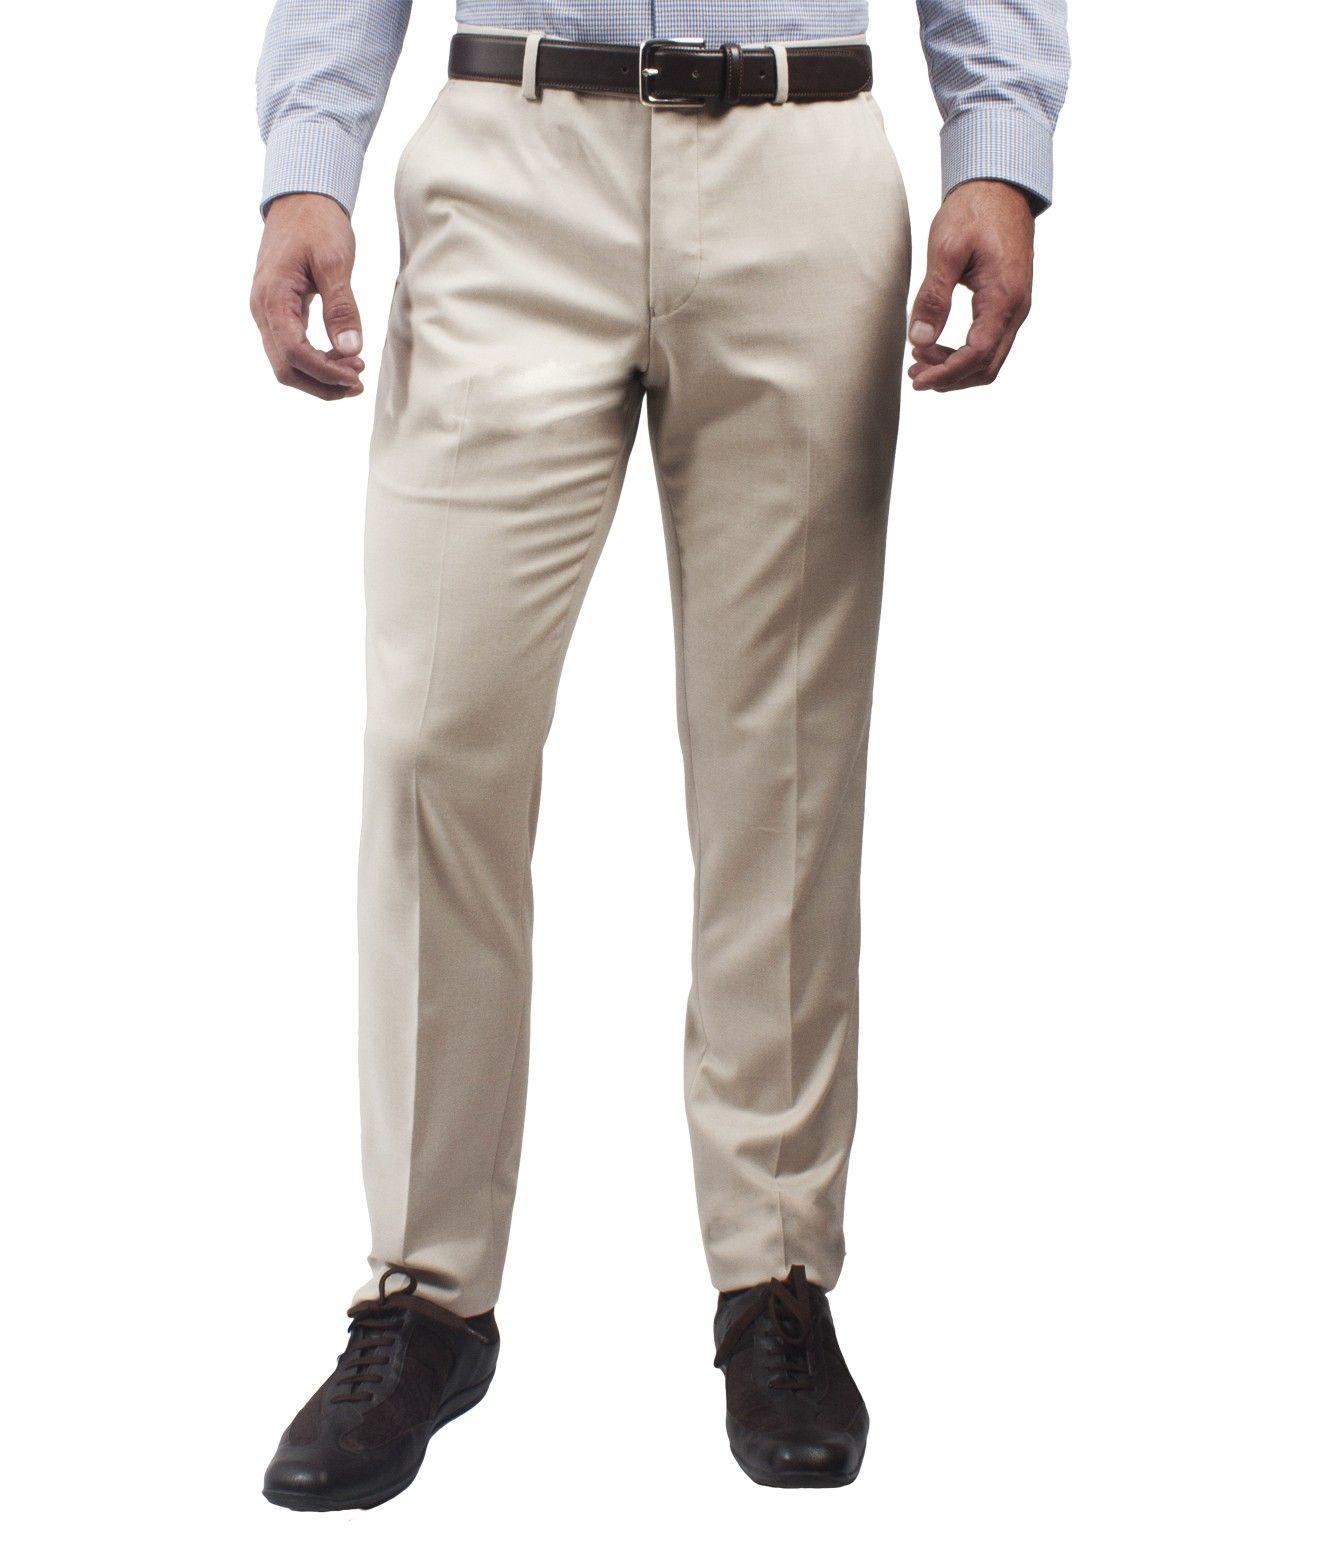 Pantalon De Vestir Lmental Beige Composicion 65 Poliester 33 Viscosa 2 Elastano Pantalones De Vestir Jeans Para Hombre Traje Formal Hombre